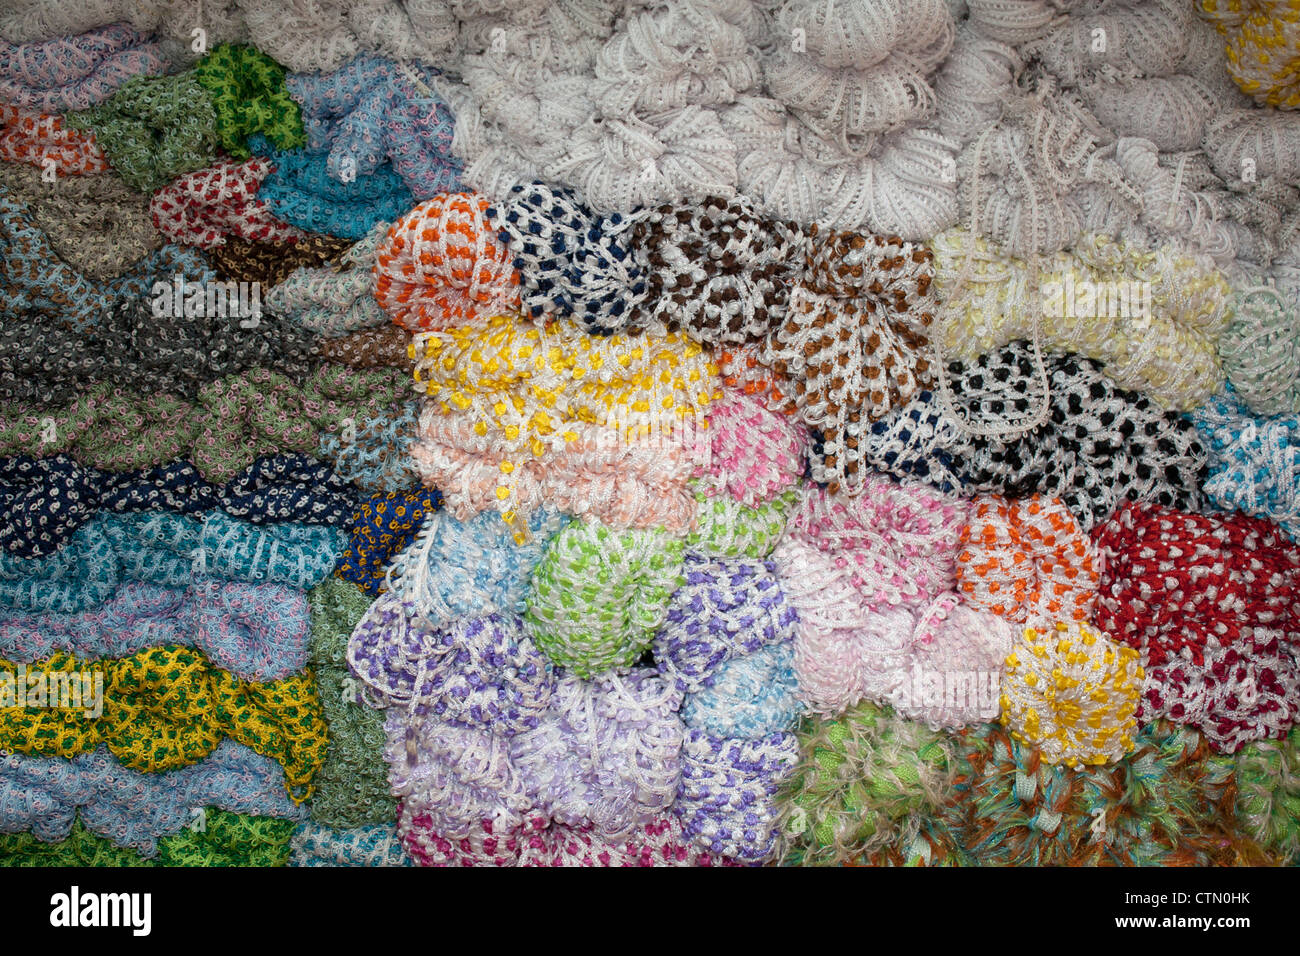 Skeins of trimmings for sale in haberdashery shop in Kinari Bazar, Old Delhi, India - Stock Image